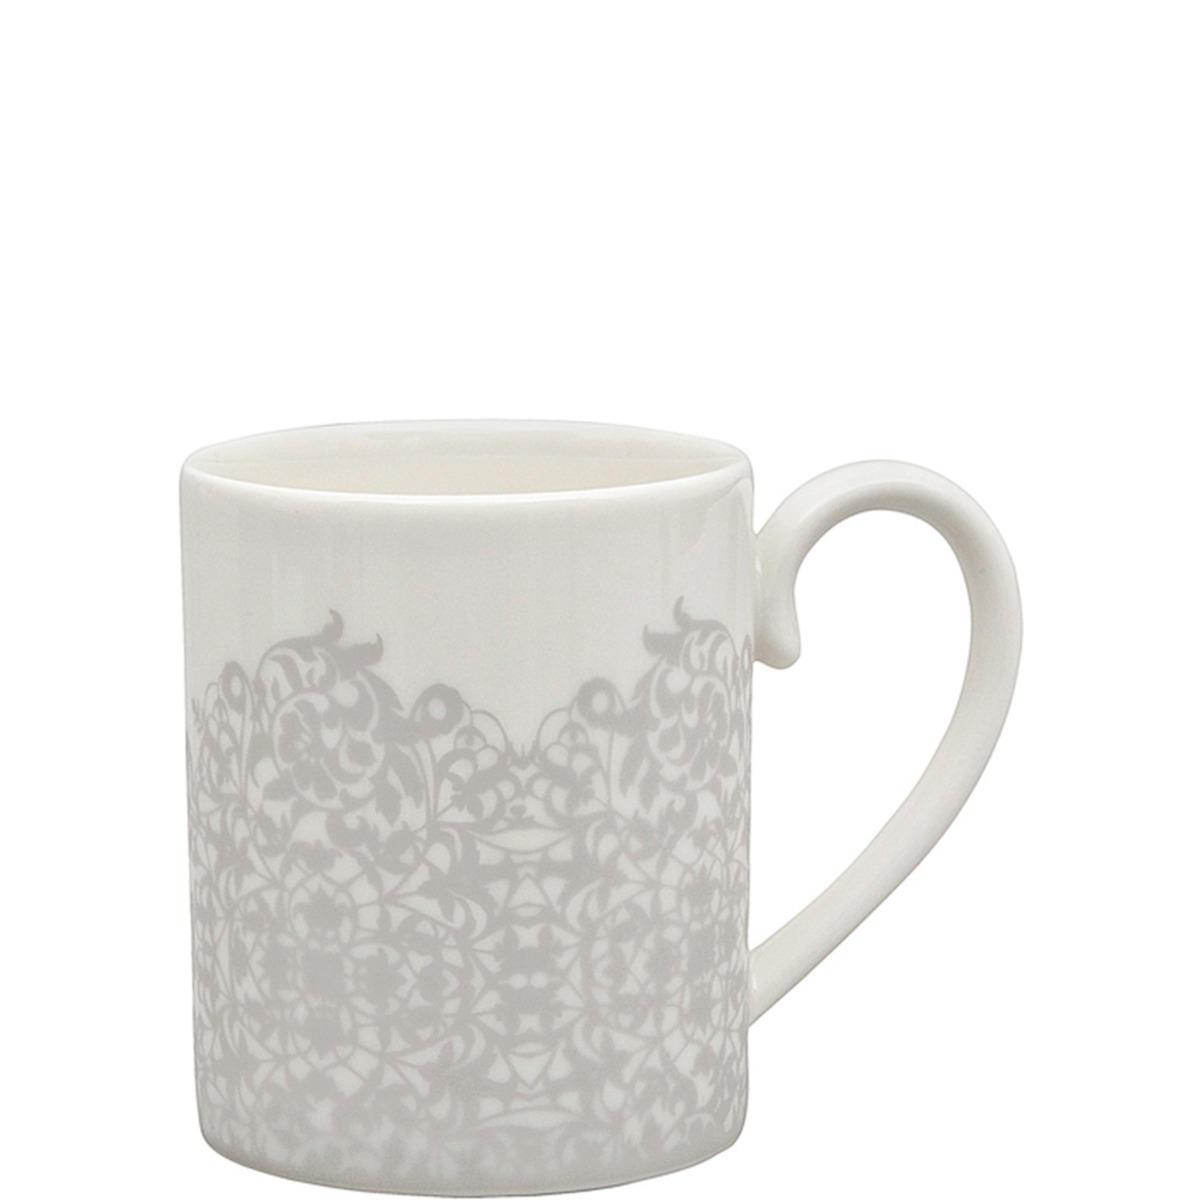 120709946: Monsoon Filigree Silver Can Mug